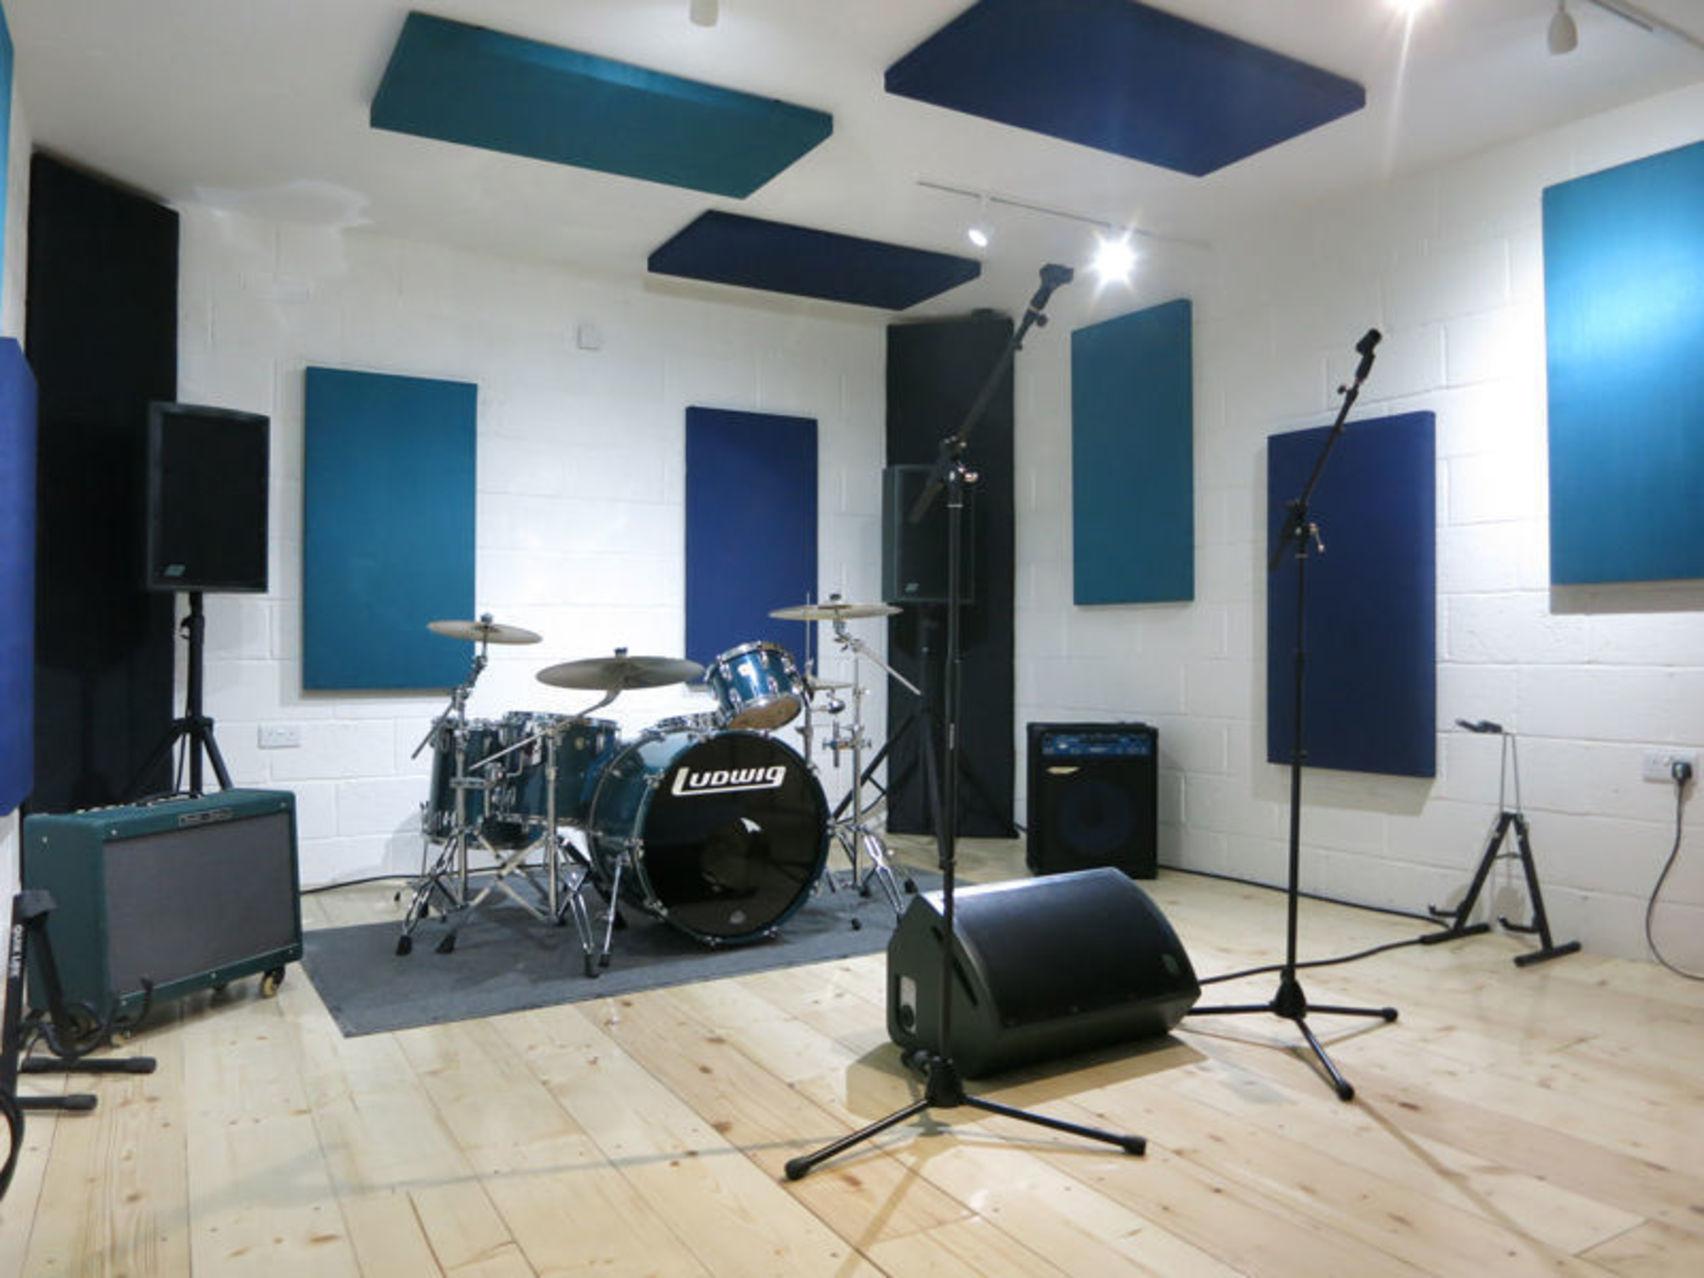 Studio 3, The Blue Studios